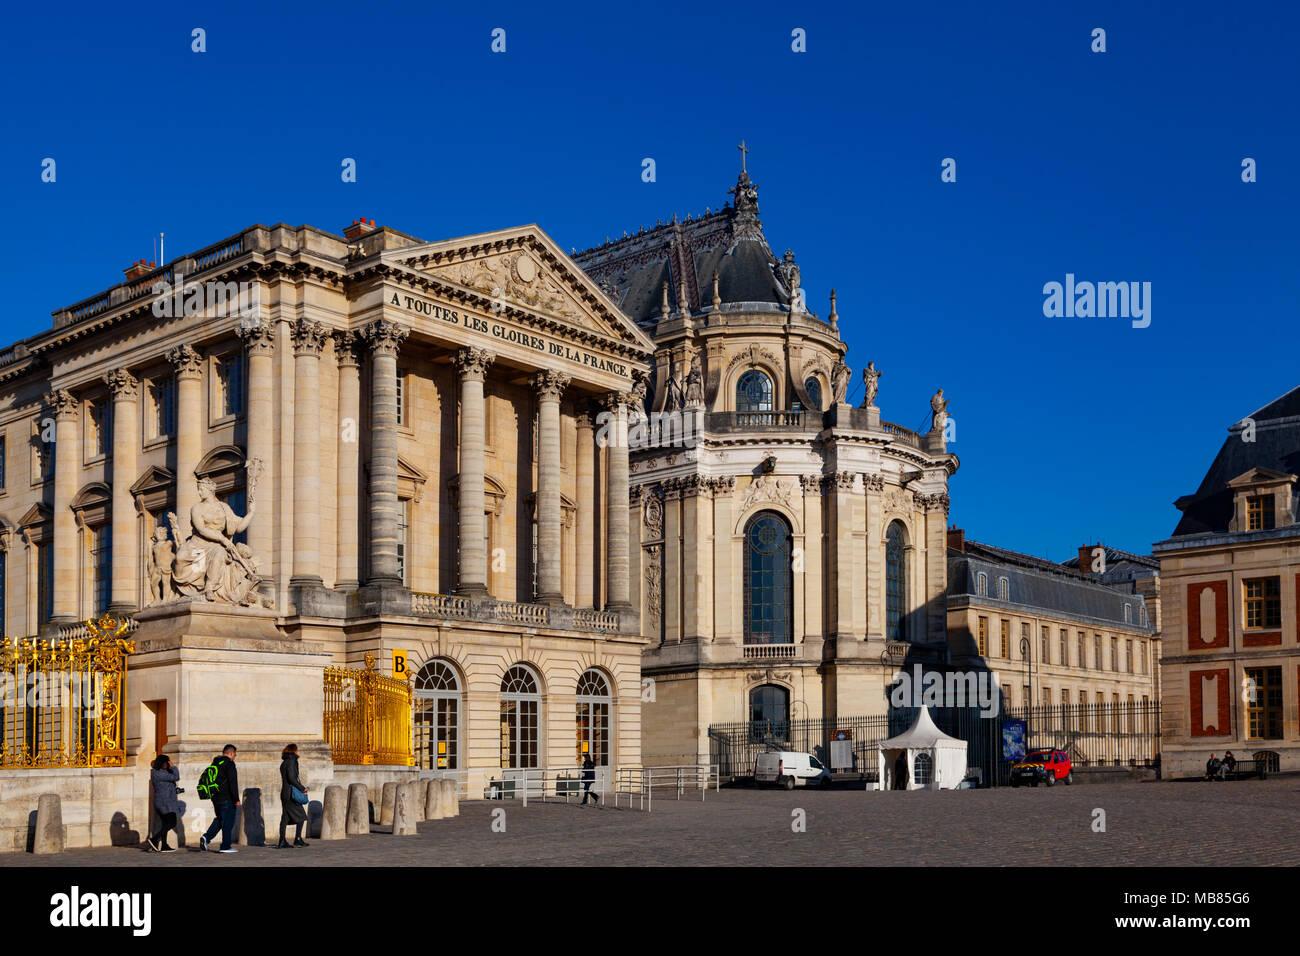 Chateau de Versailles (Palace of Versailles), a UNESCO World Heritage Site, France - Stock Image